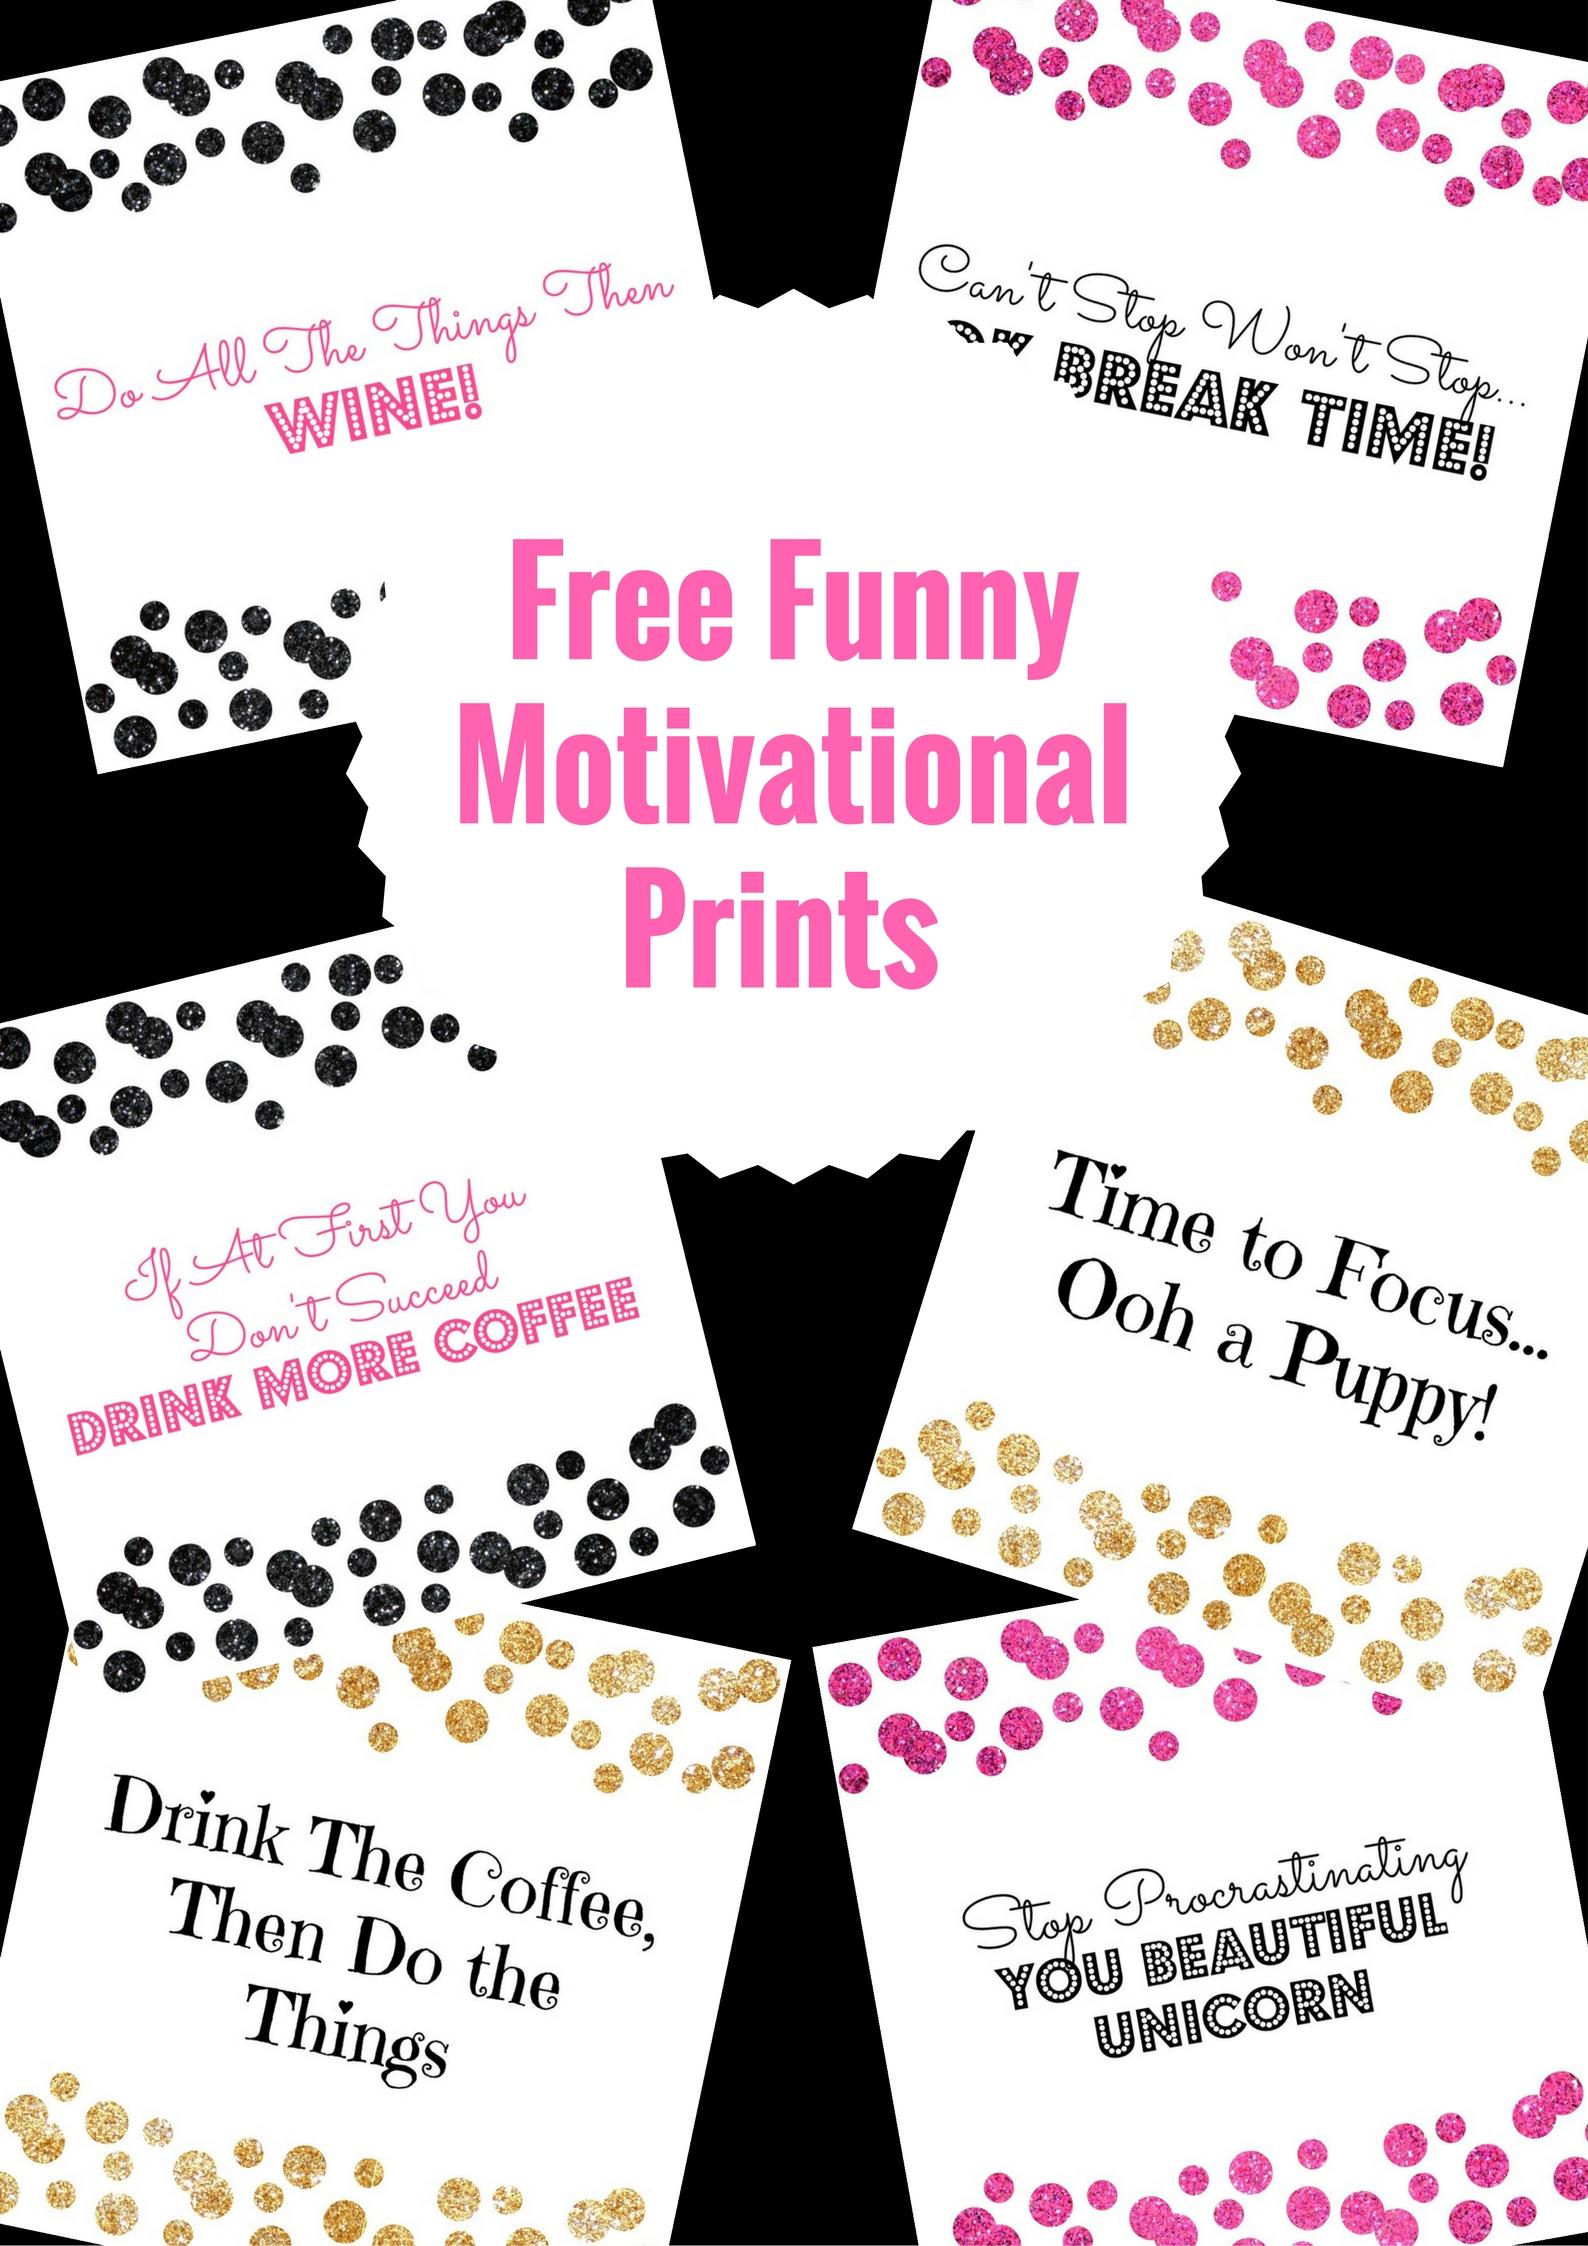 Free Funny Motivational Prints